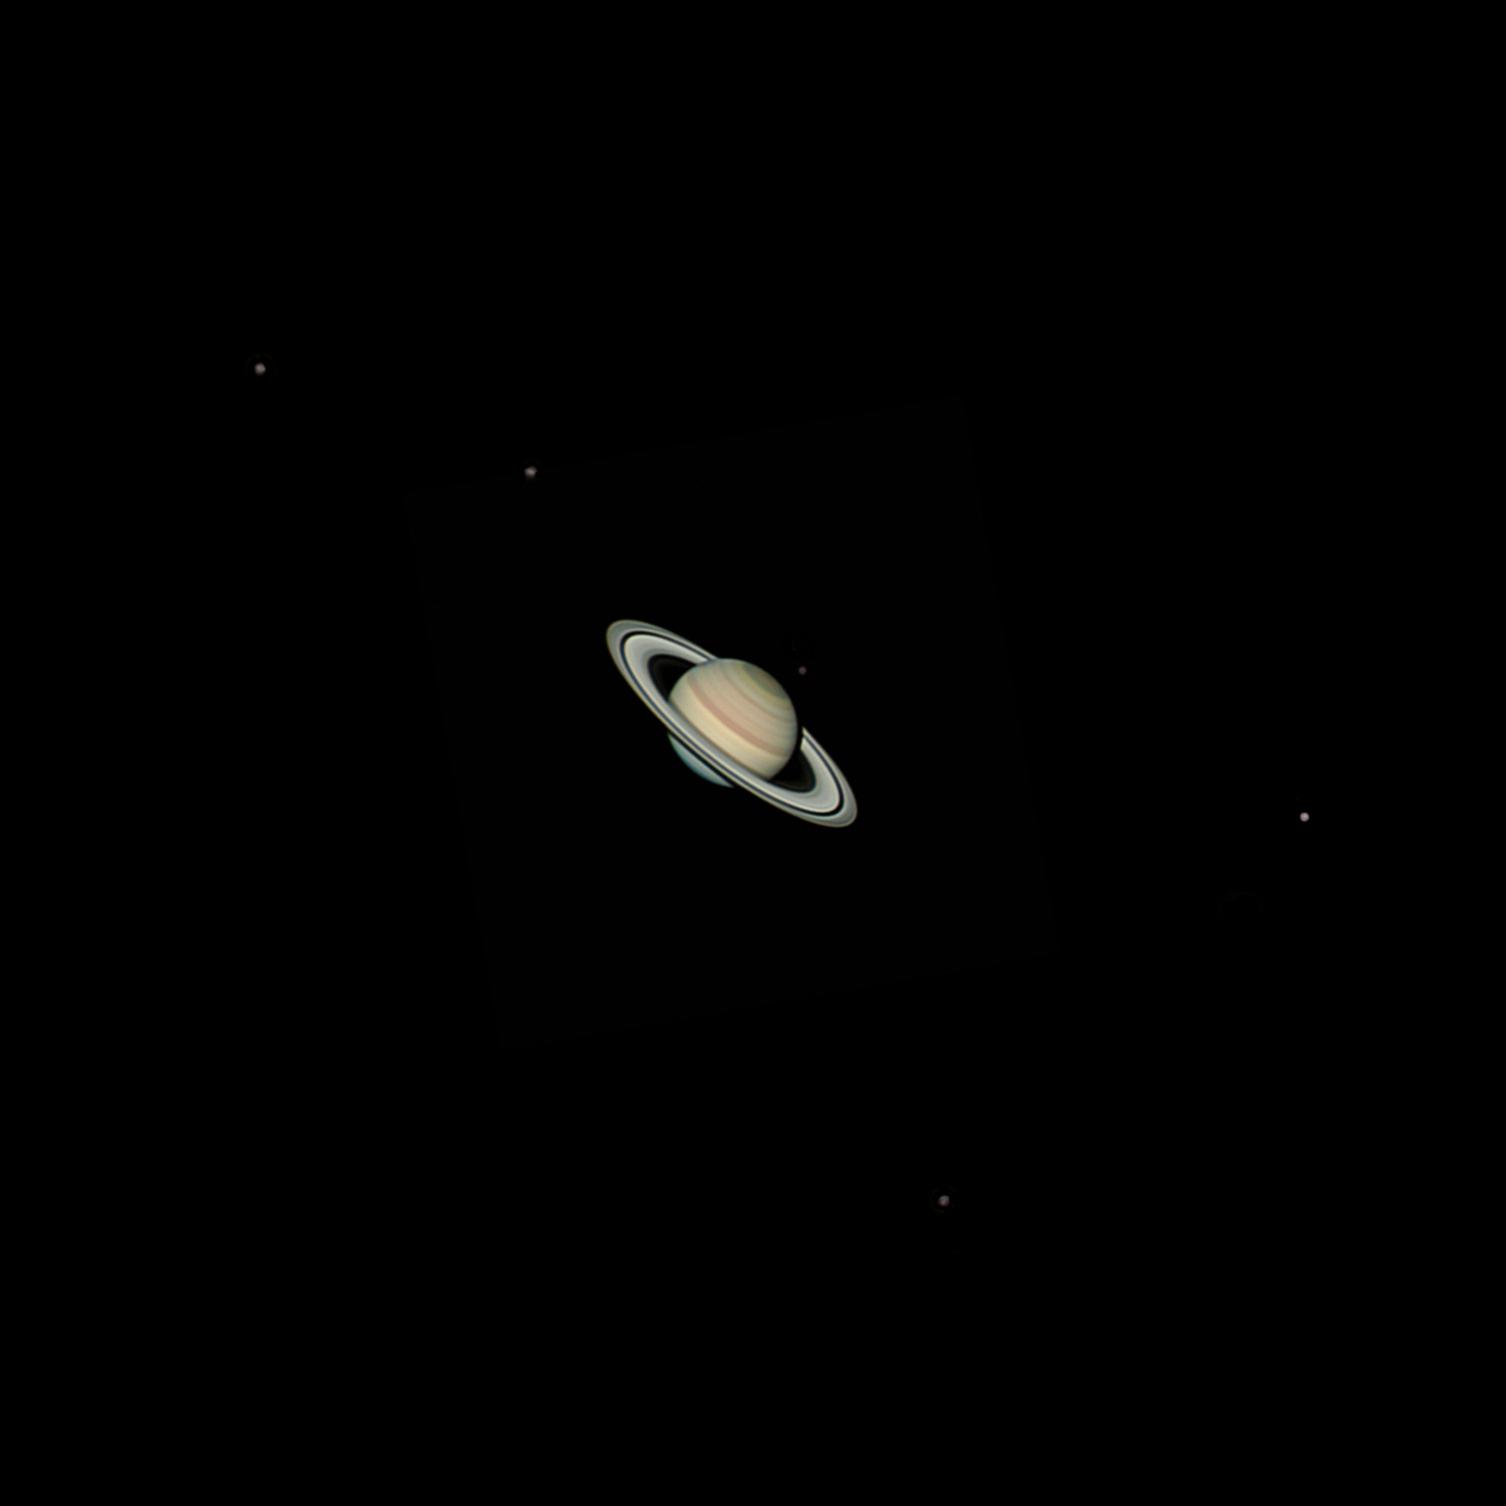 土星 土卫 2021-06-15-1906_6-Capture_lapl4_ap76-95_g4_ap84 30-2.jpg